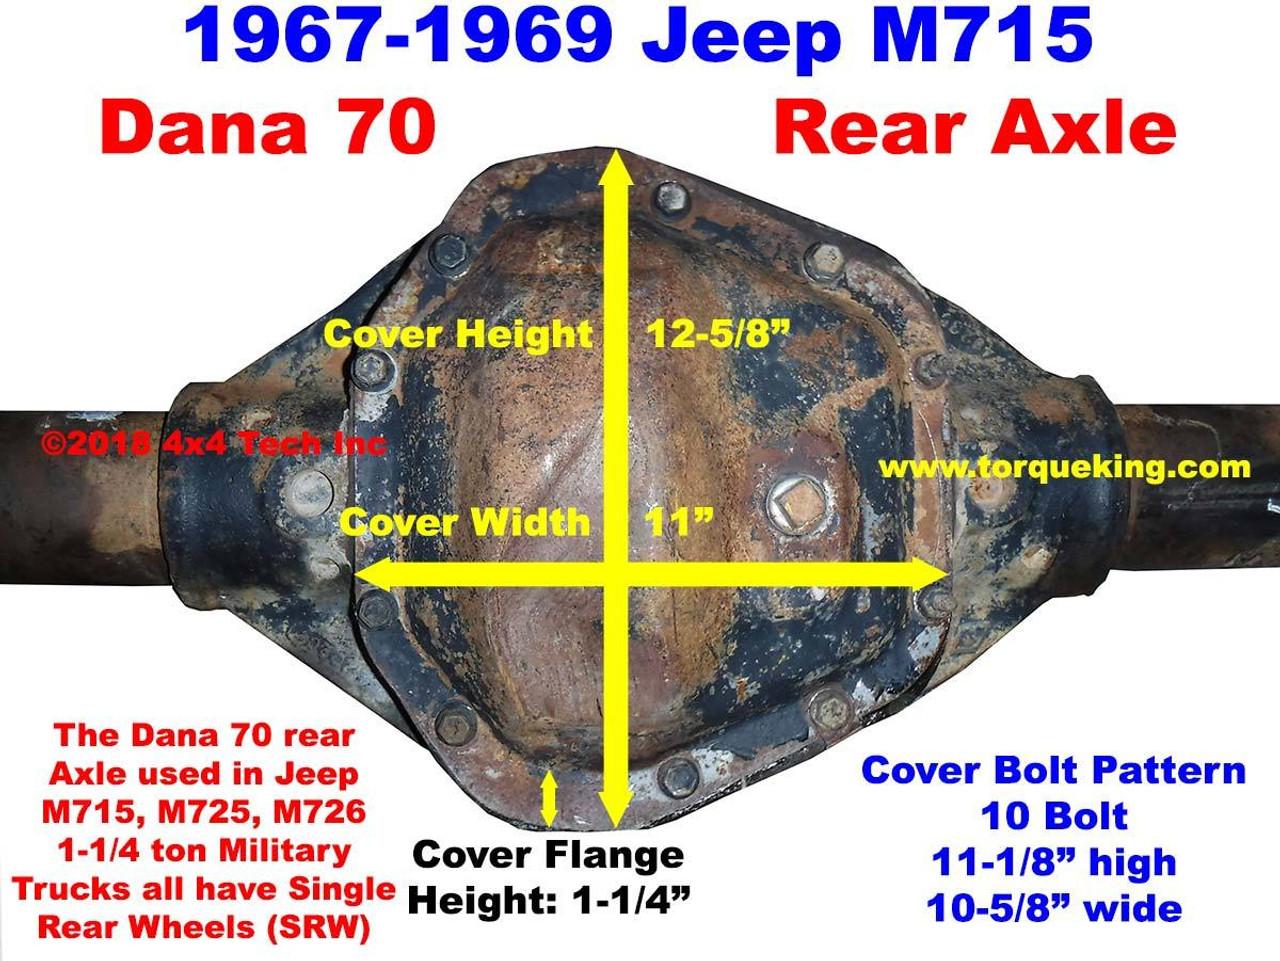 Dana 70 Parts Manuals 1967 1969 Jeep M715 Rear Axle Schematic